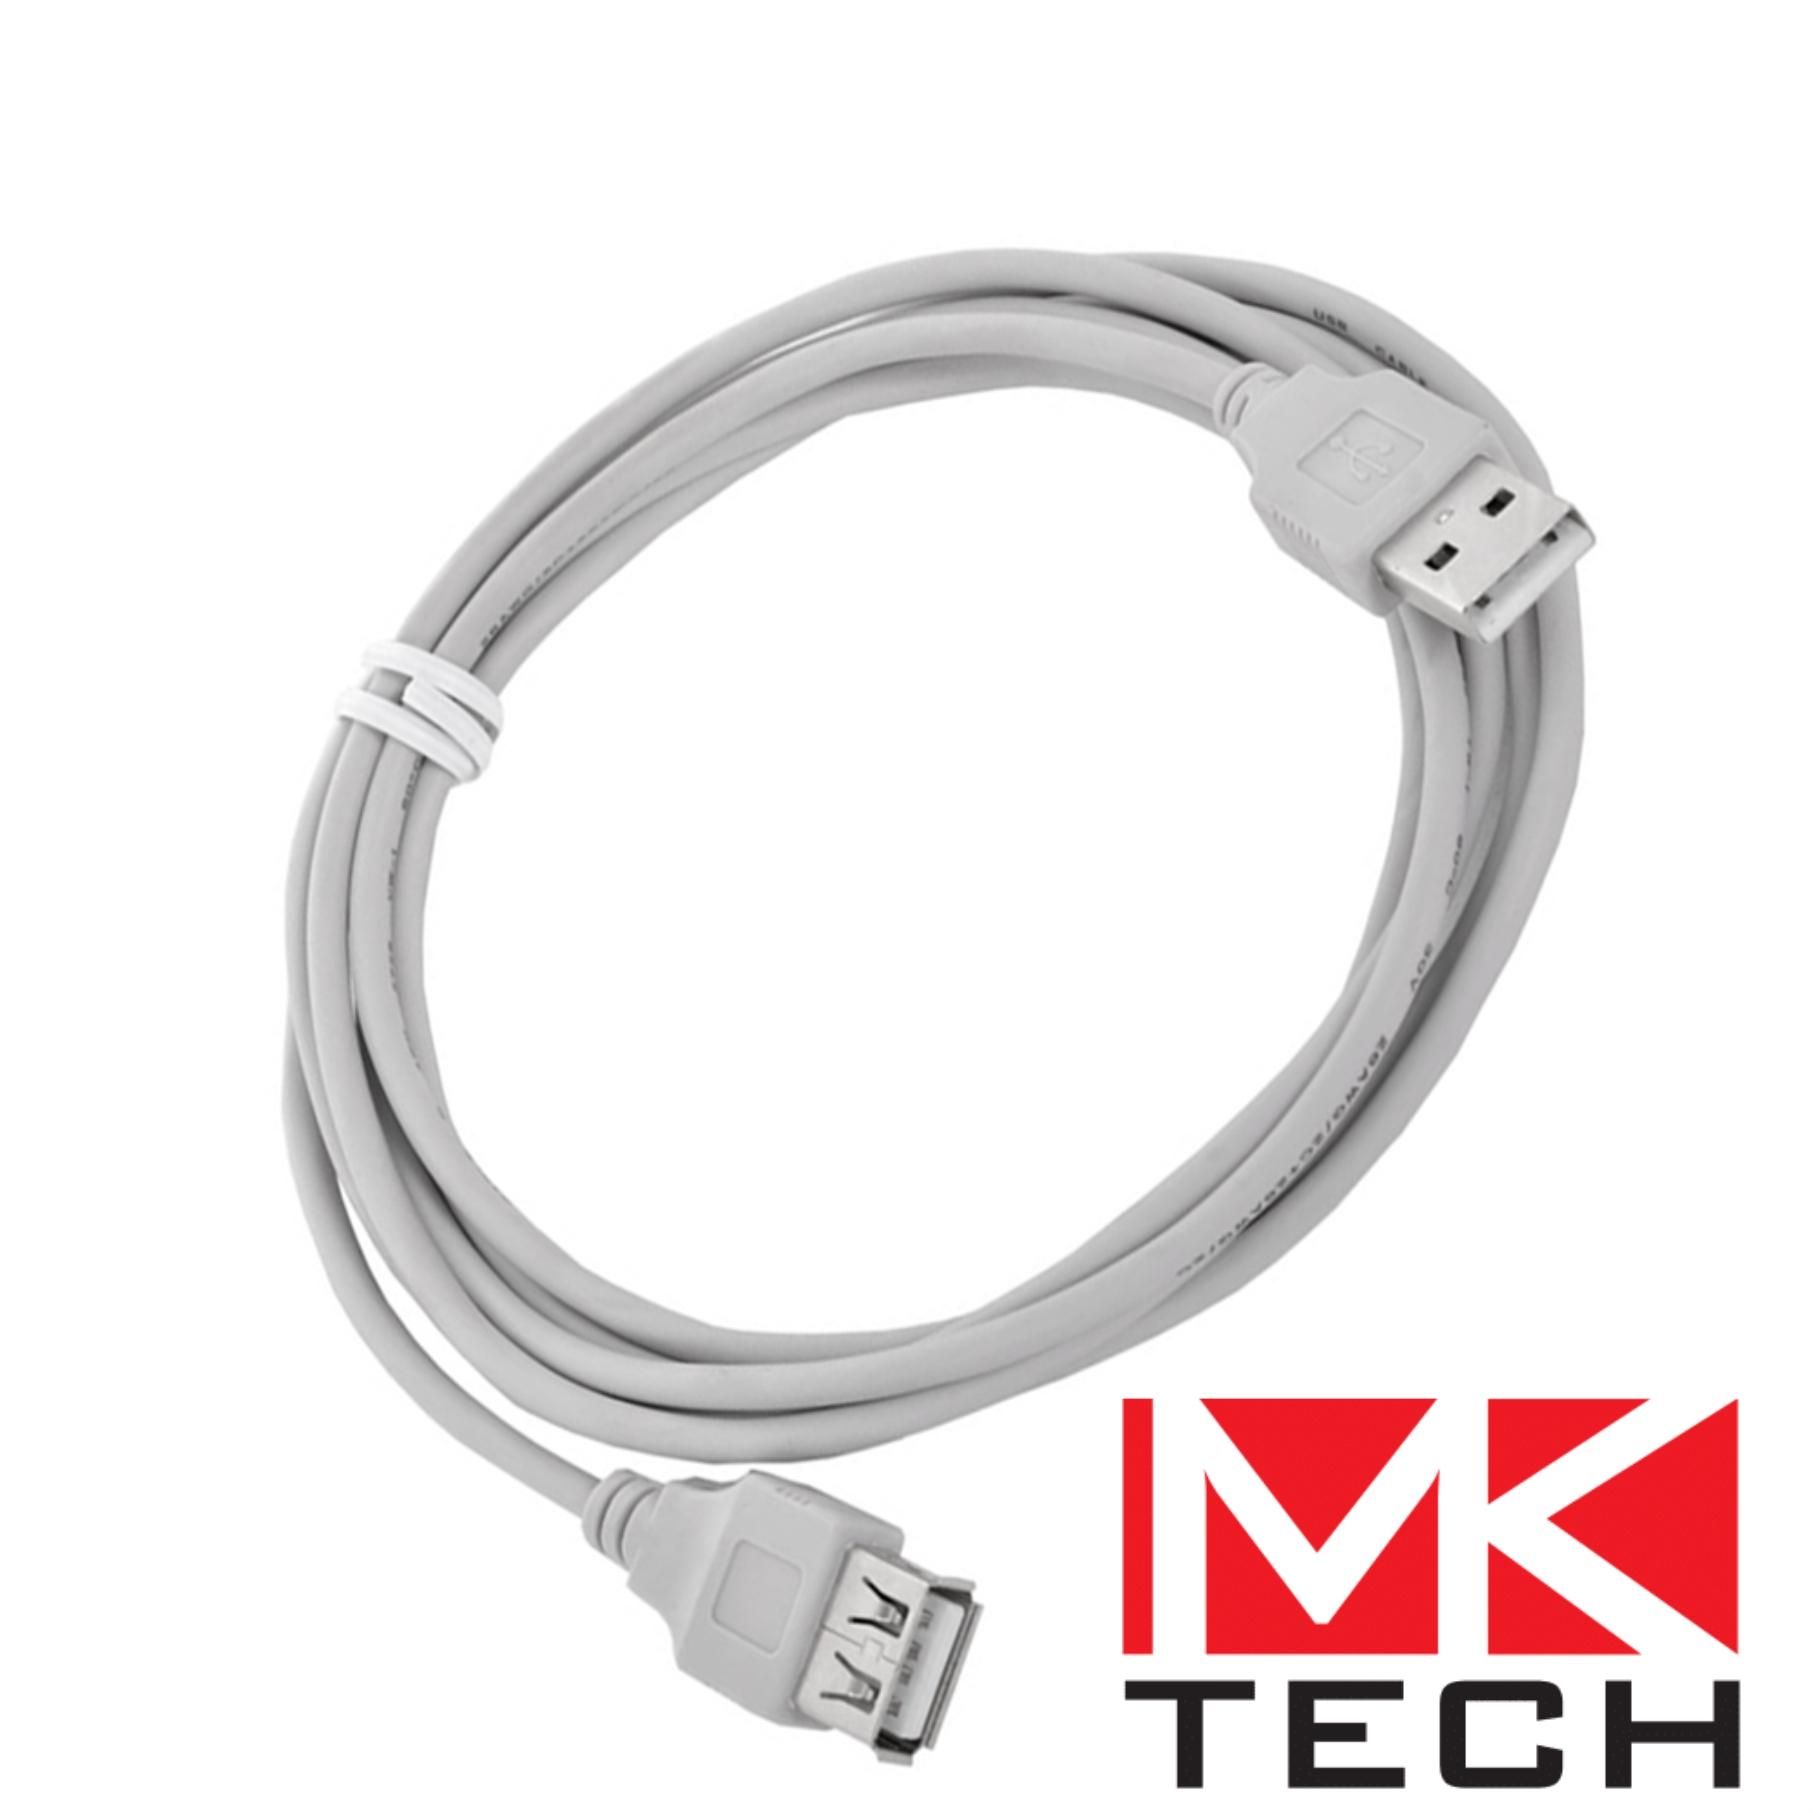 Удължител USB AM-AF 1.8m Кабел Сив